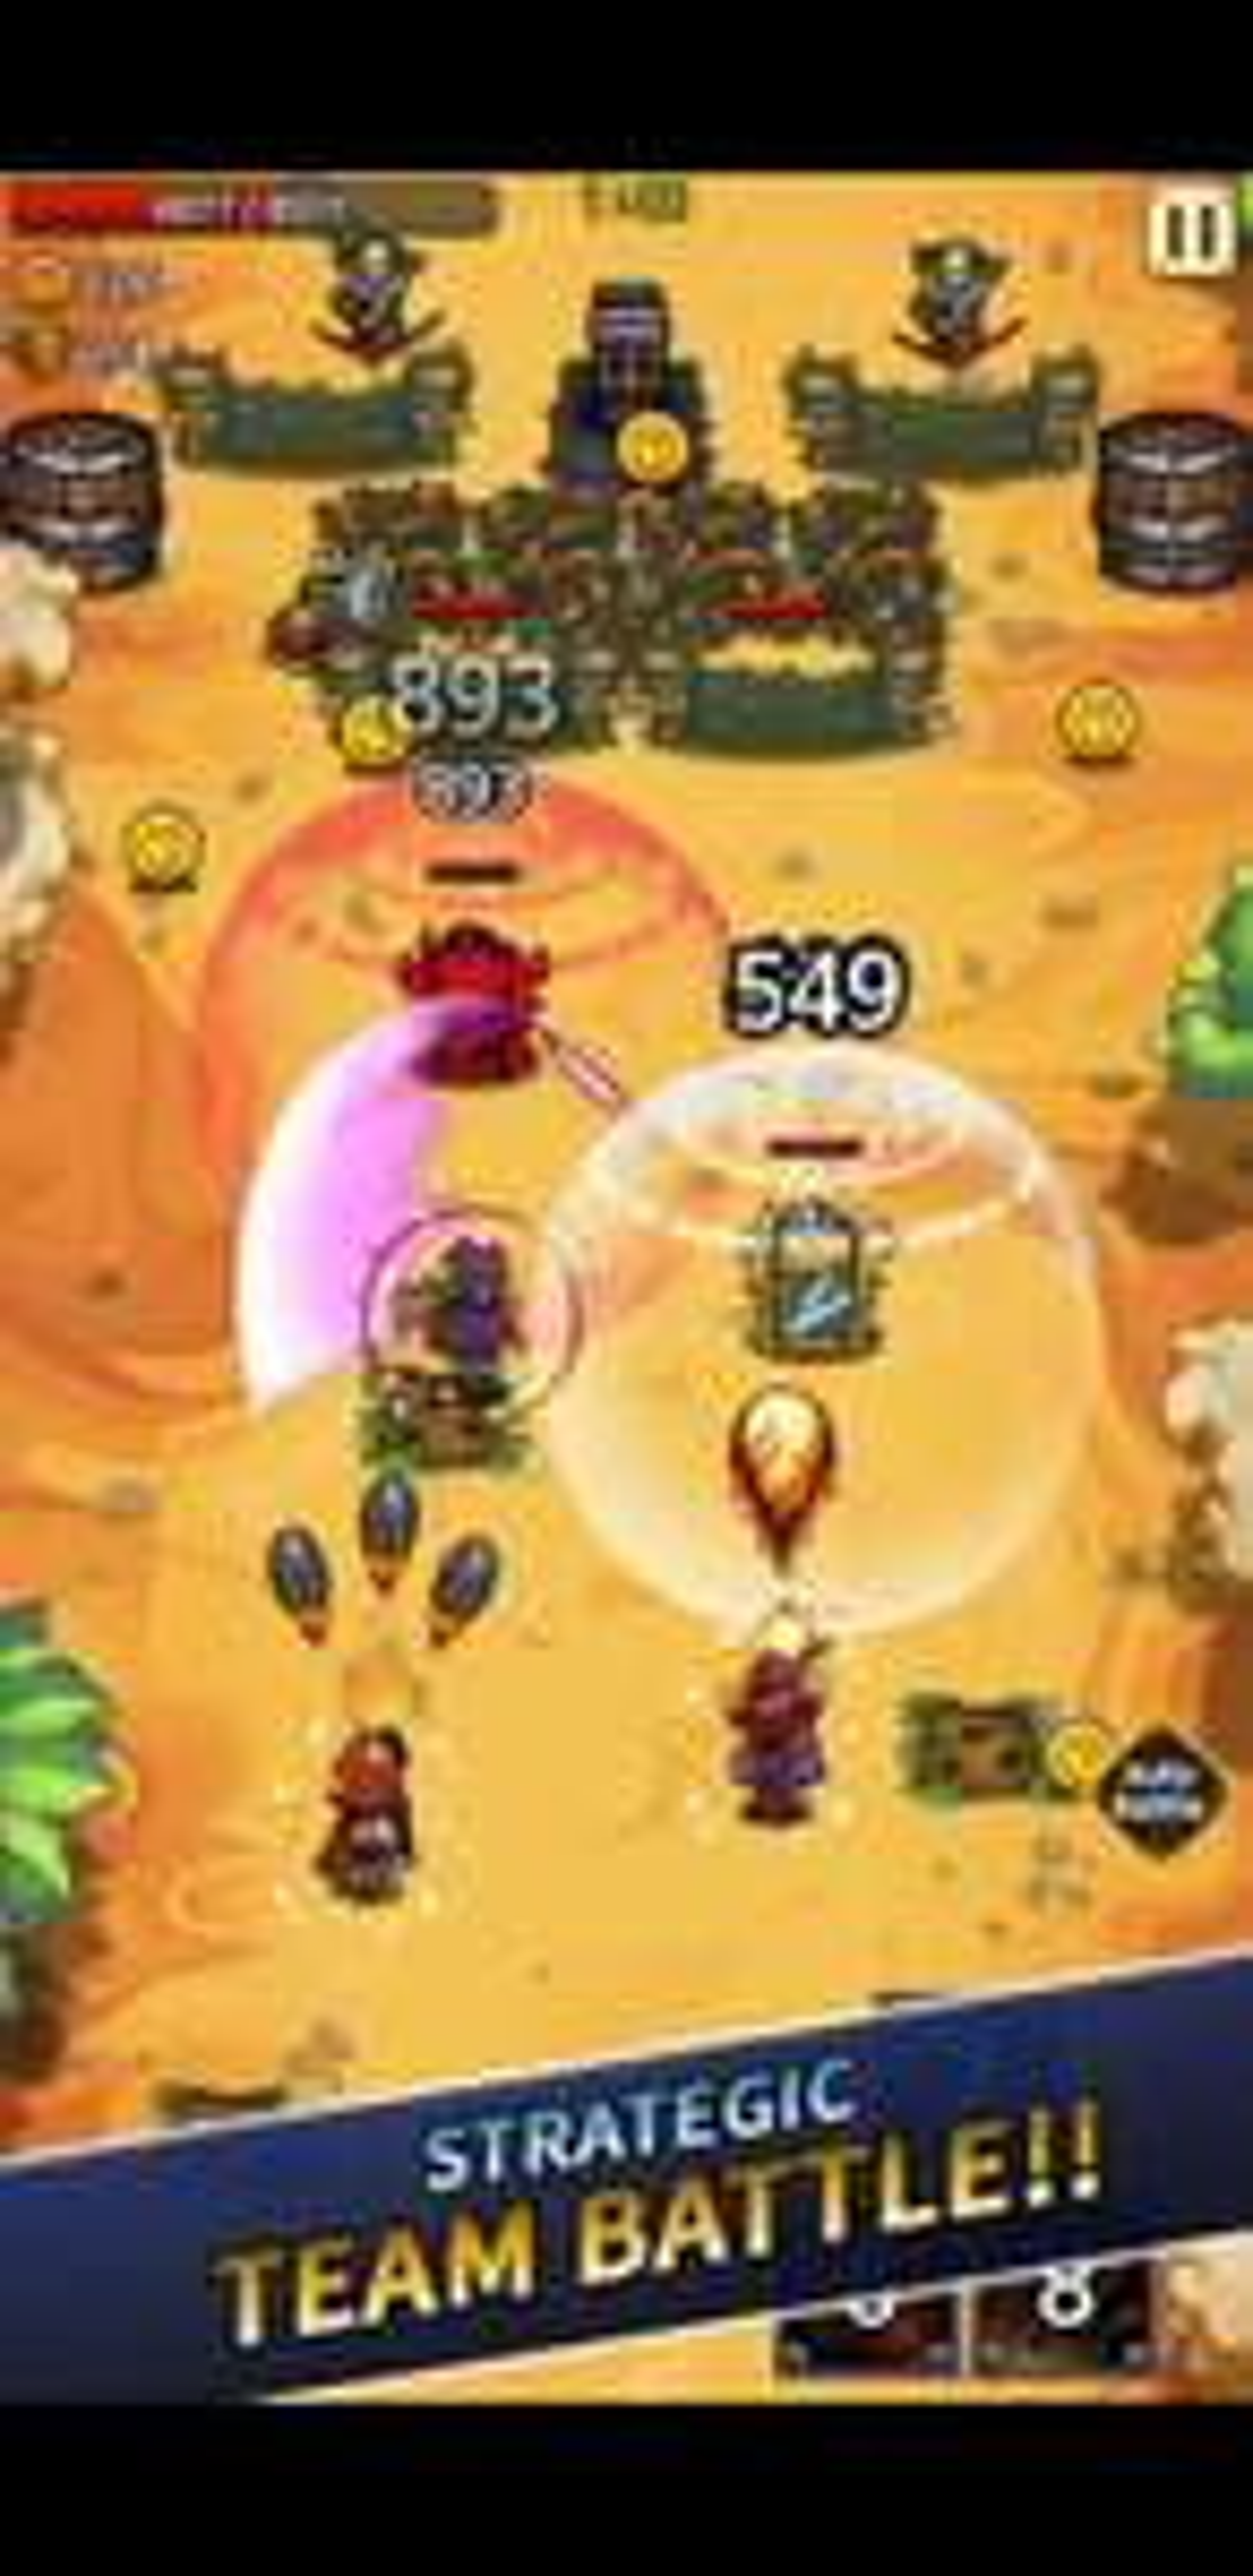 [Google Playstore] Wonder Knights VIP: Retro Shooter RPG